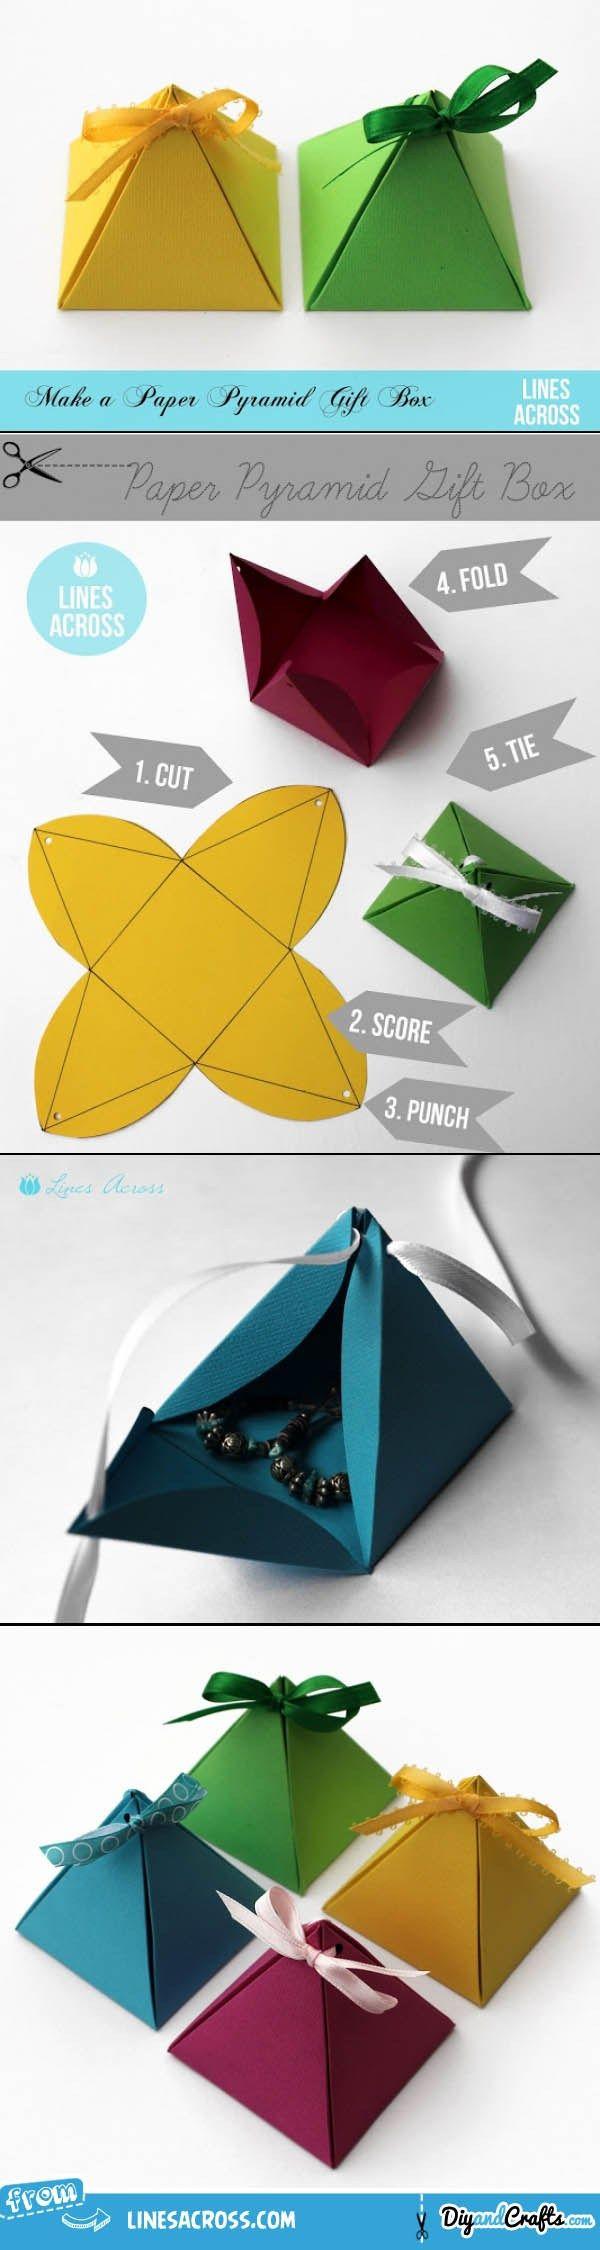 Paper Pyramid Gift Boxes | DIY | DIY & Crafts